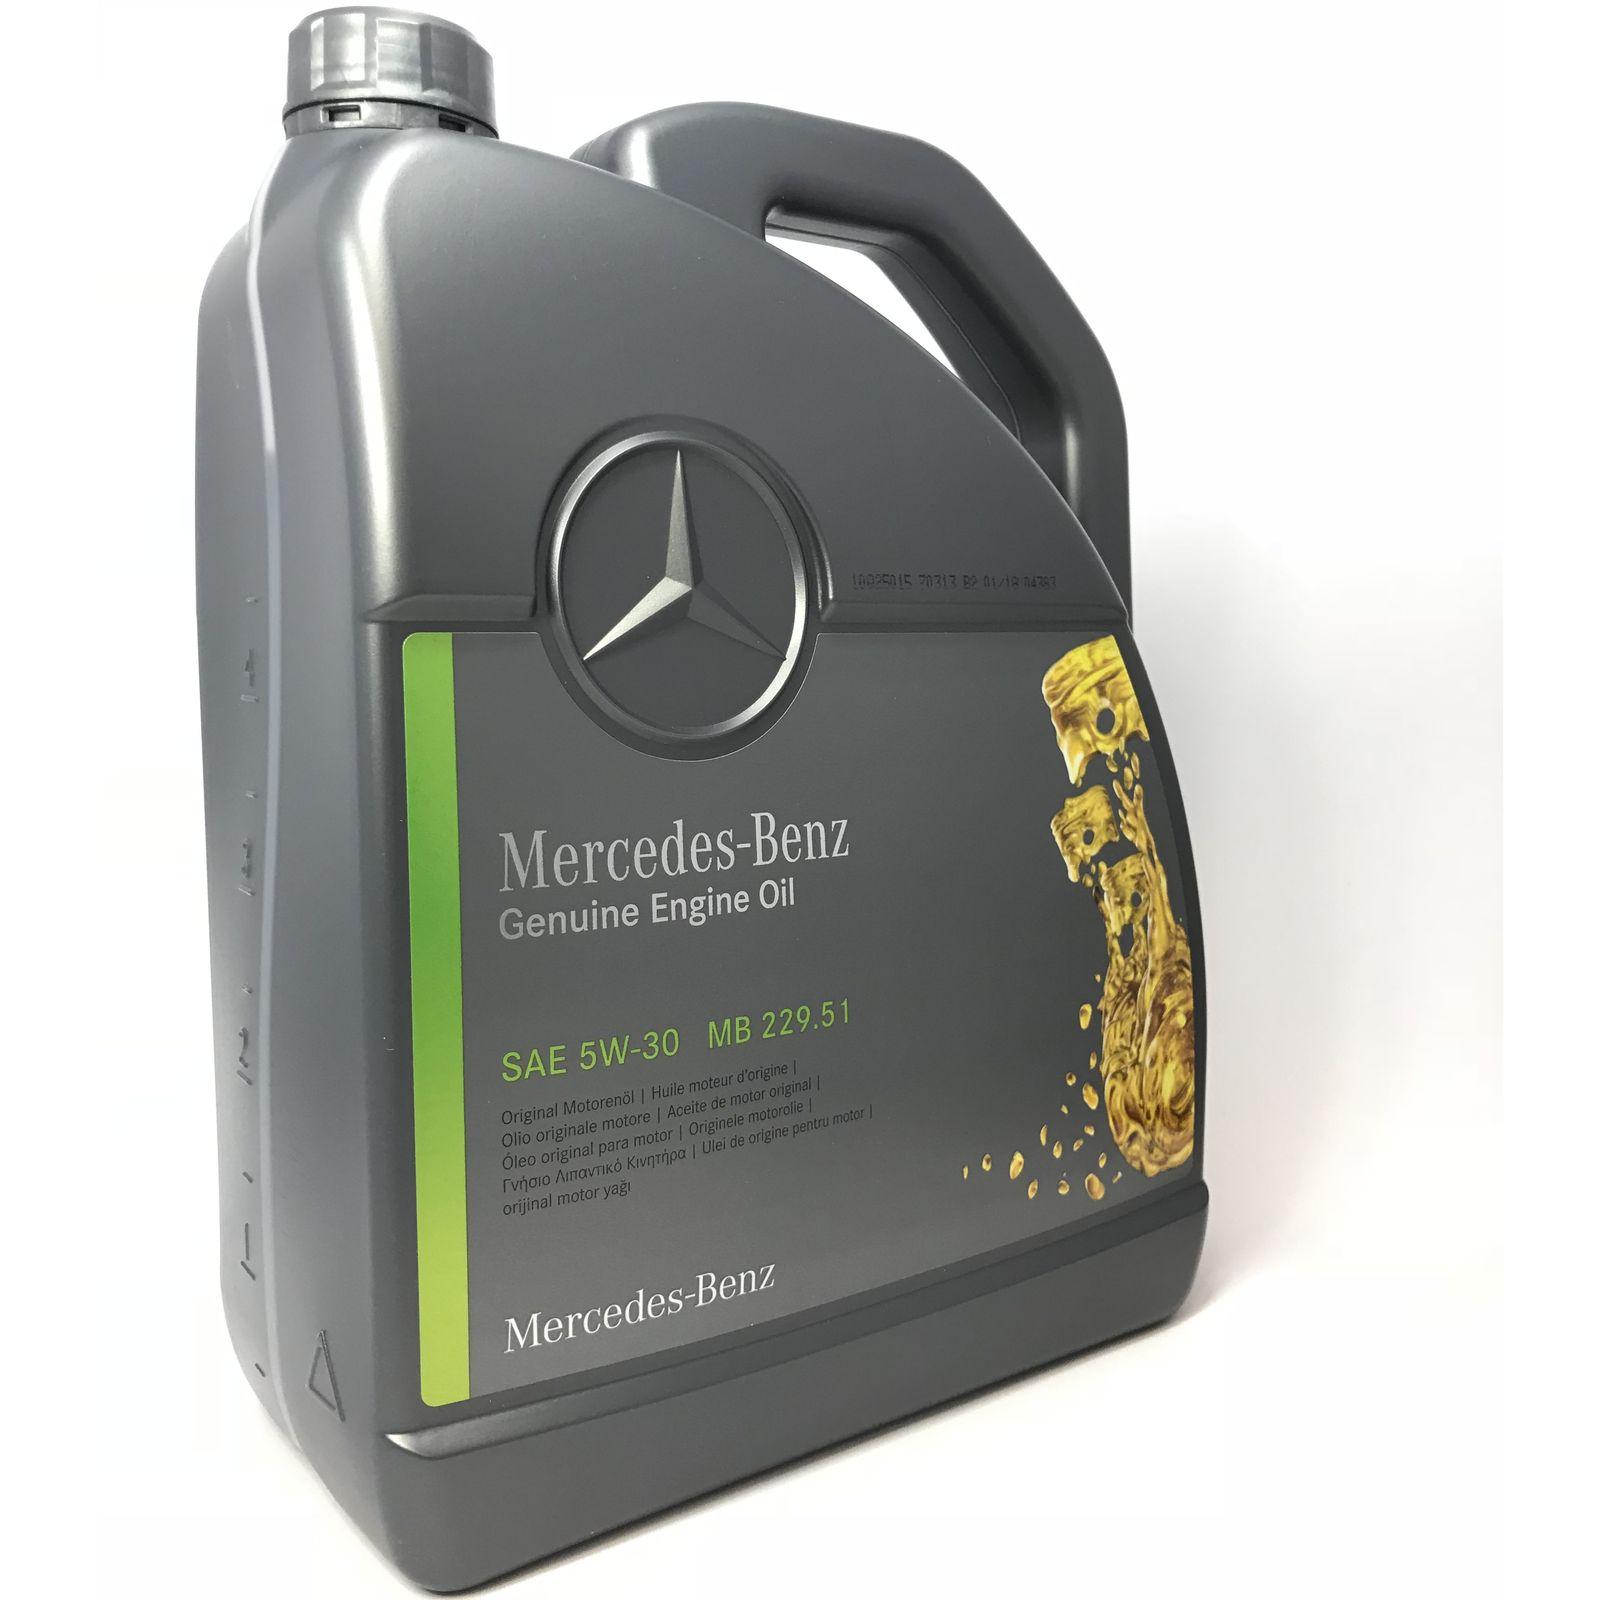 5 Liter Original Mercedes Motoröl 5W-30 MB 229.51